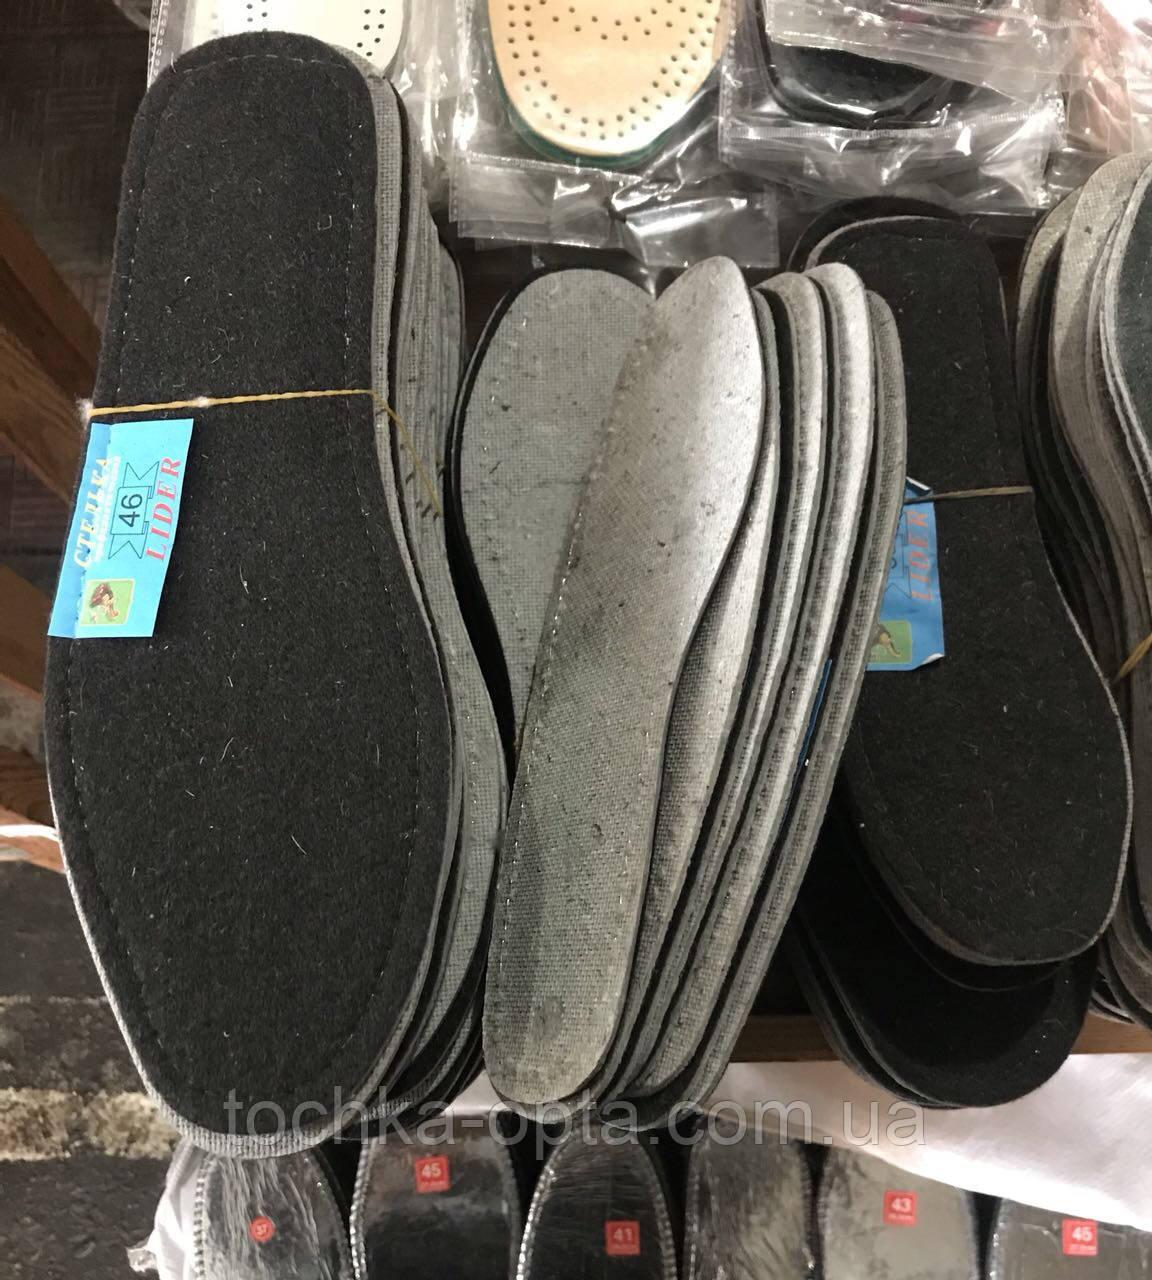 Стелька для обуви байка на кожкартоне 39